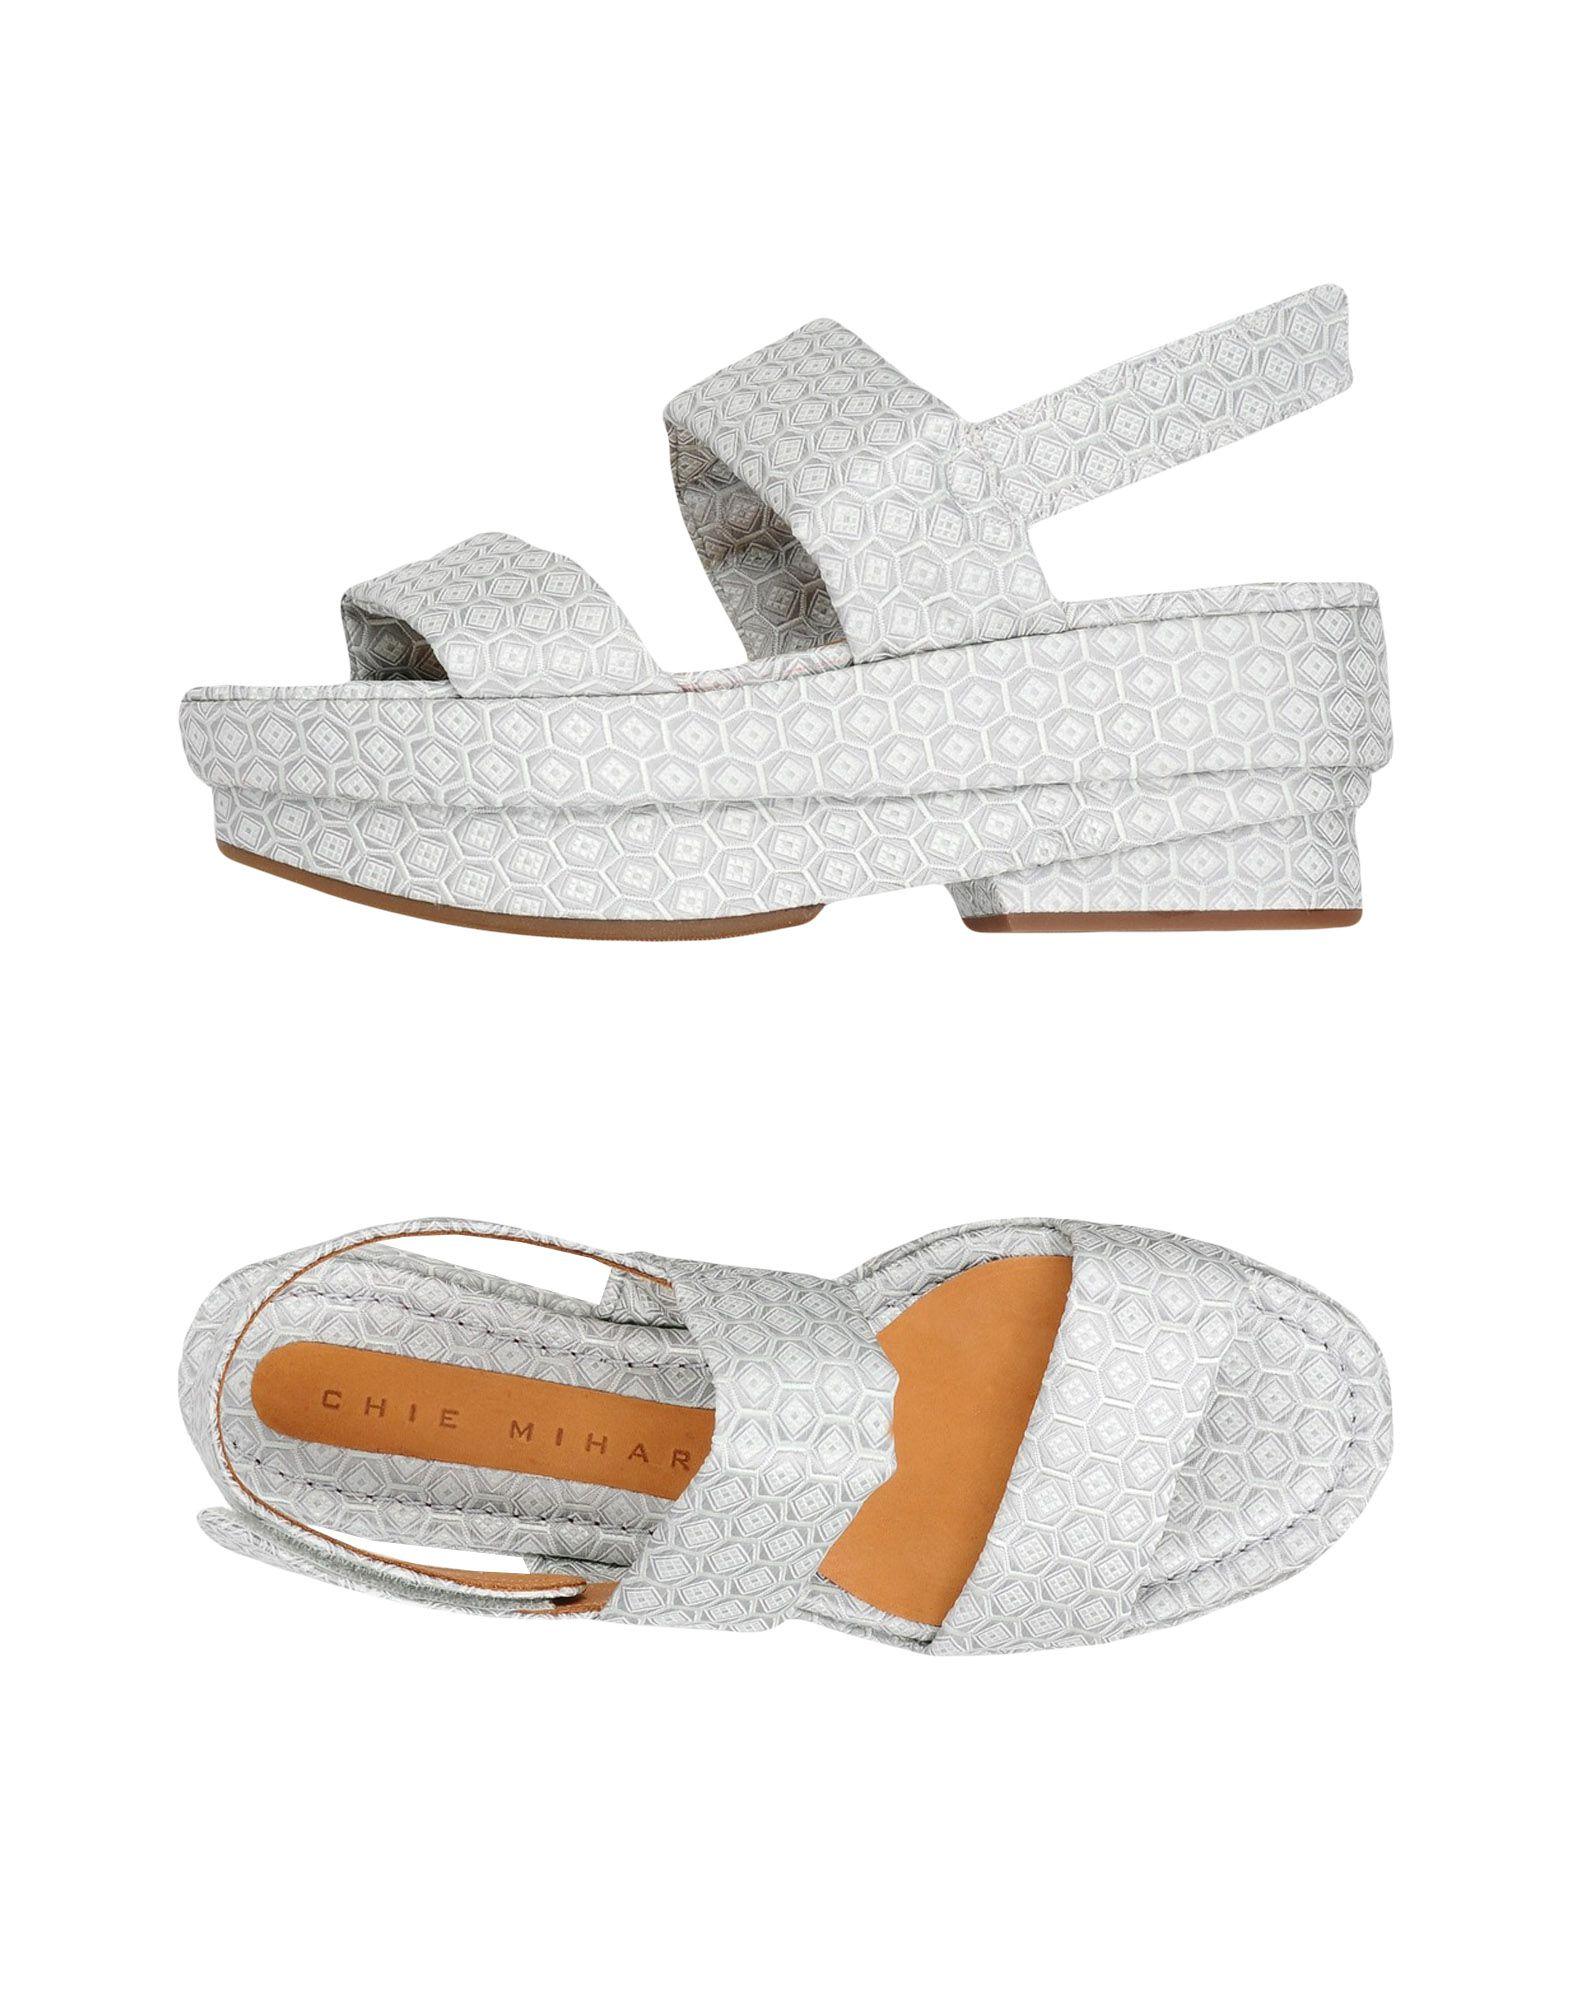 Sandales Chie Mihara Dragon - Femme - Sandales Chie Mihara sur